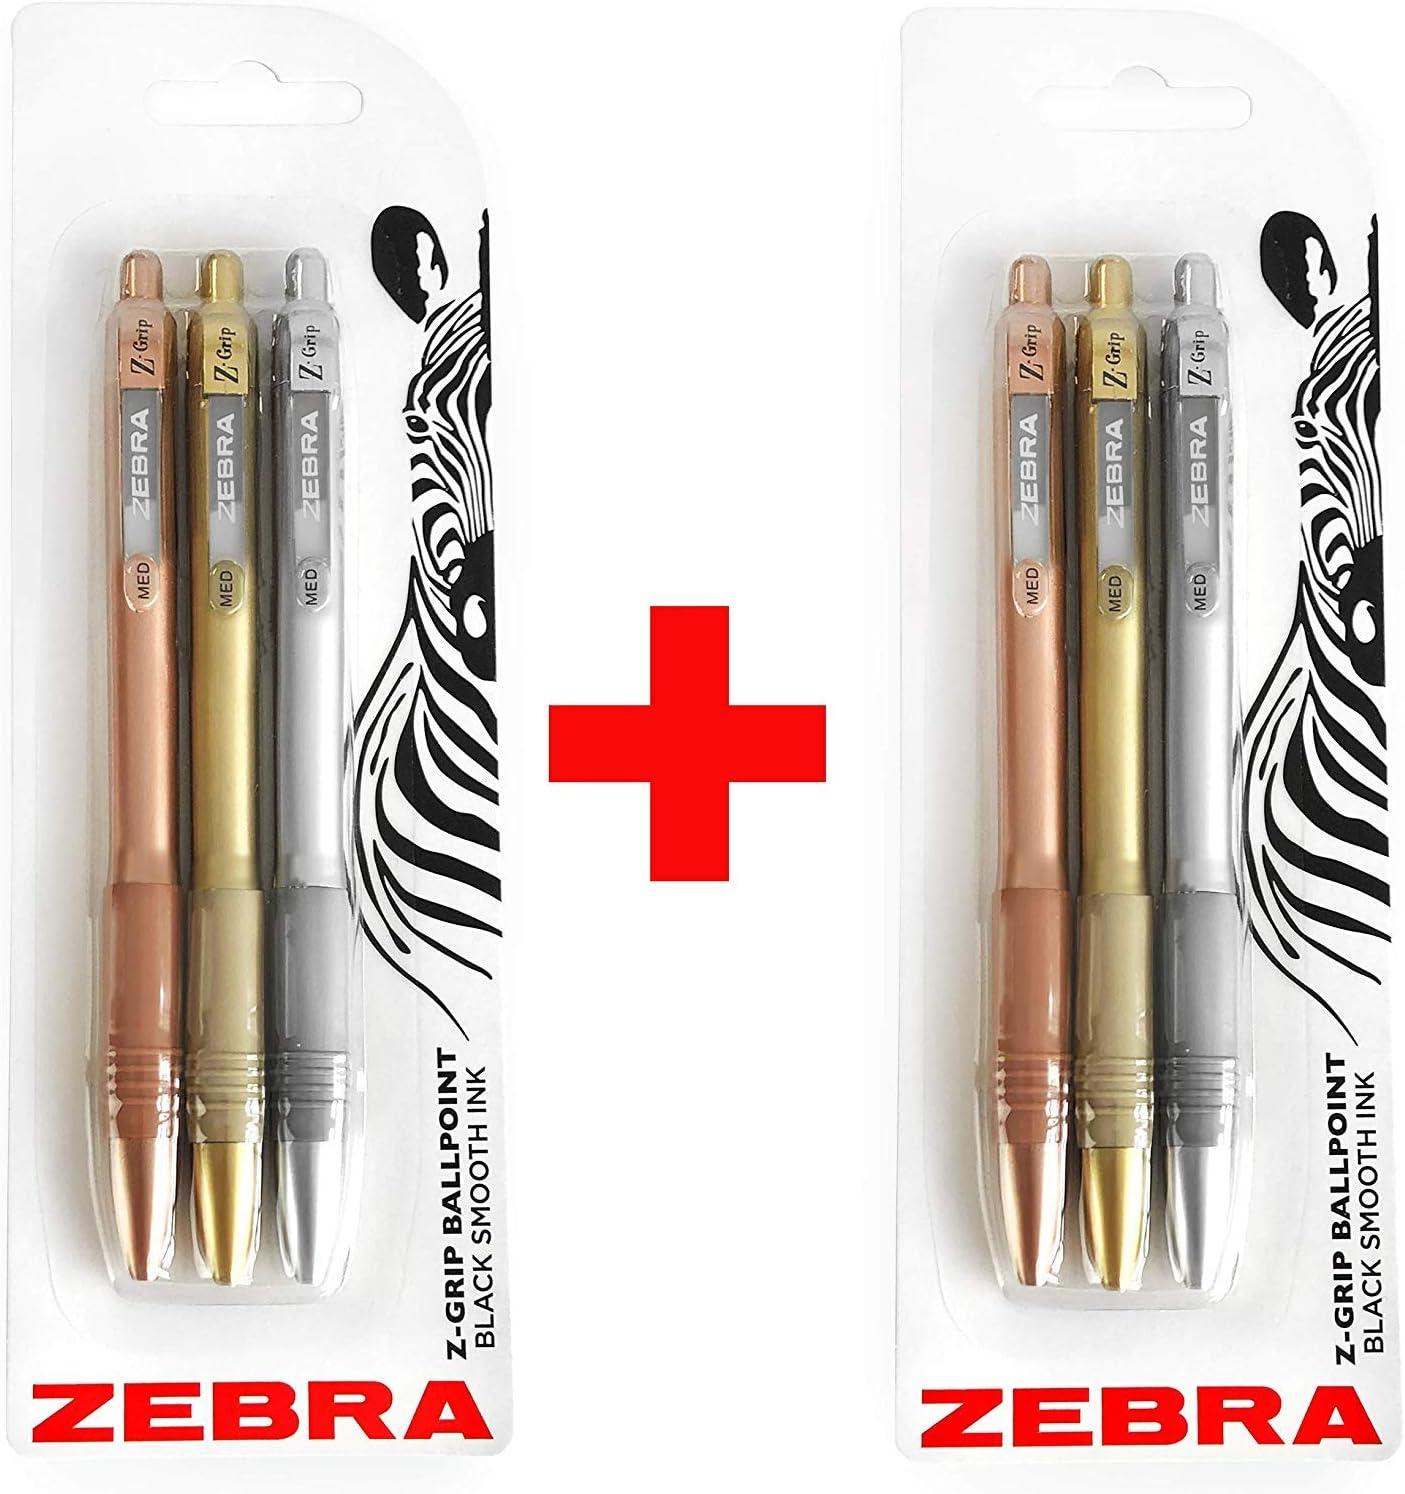 6 x Zebra Z-Grip Smooth Ballpoint Pen 1.0mm Rose Gold Barrel Black Ink